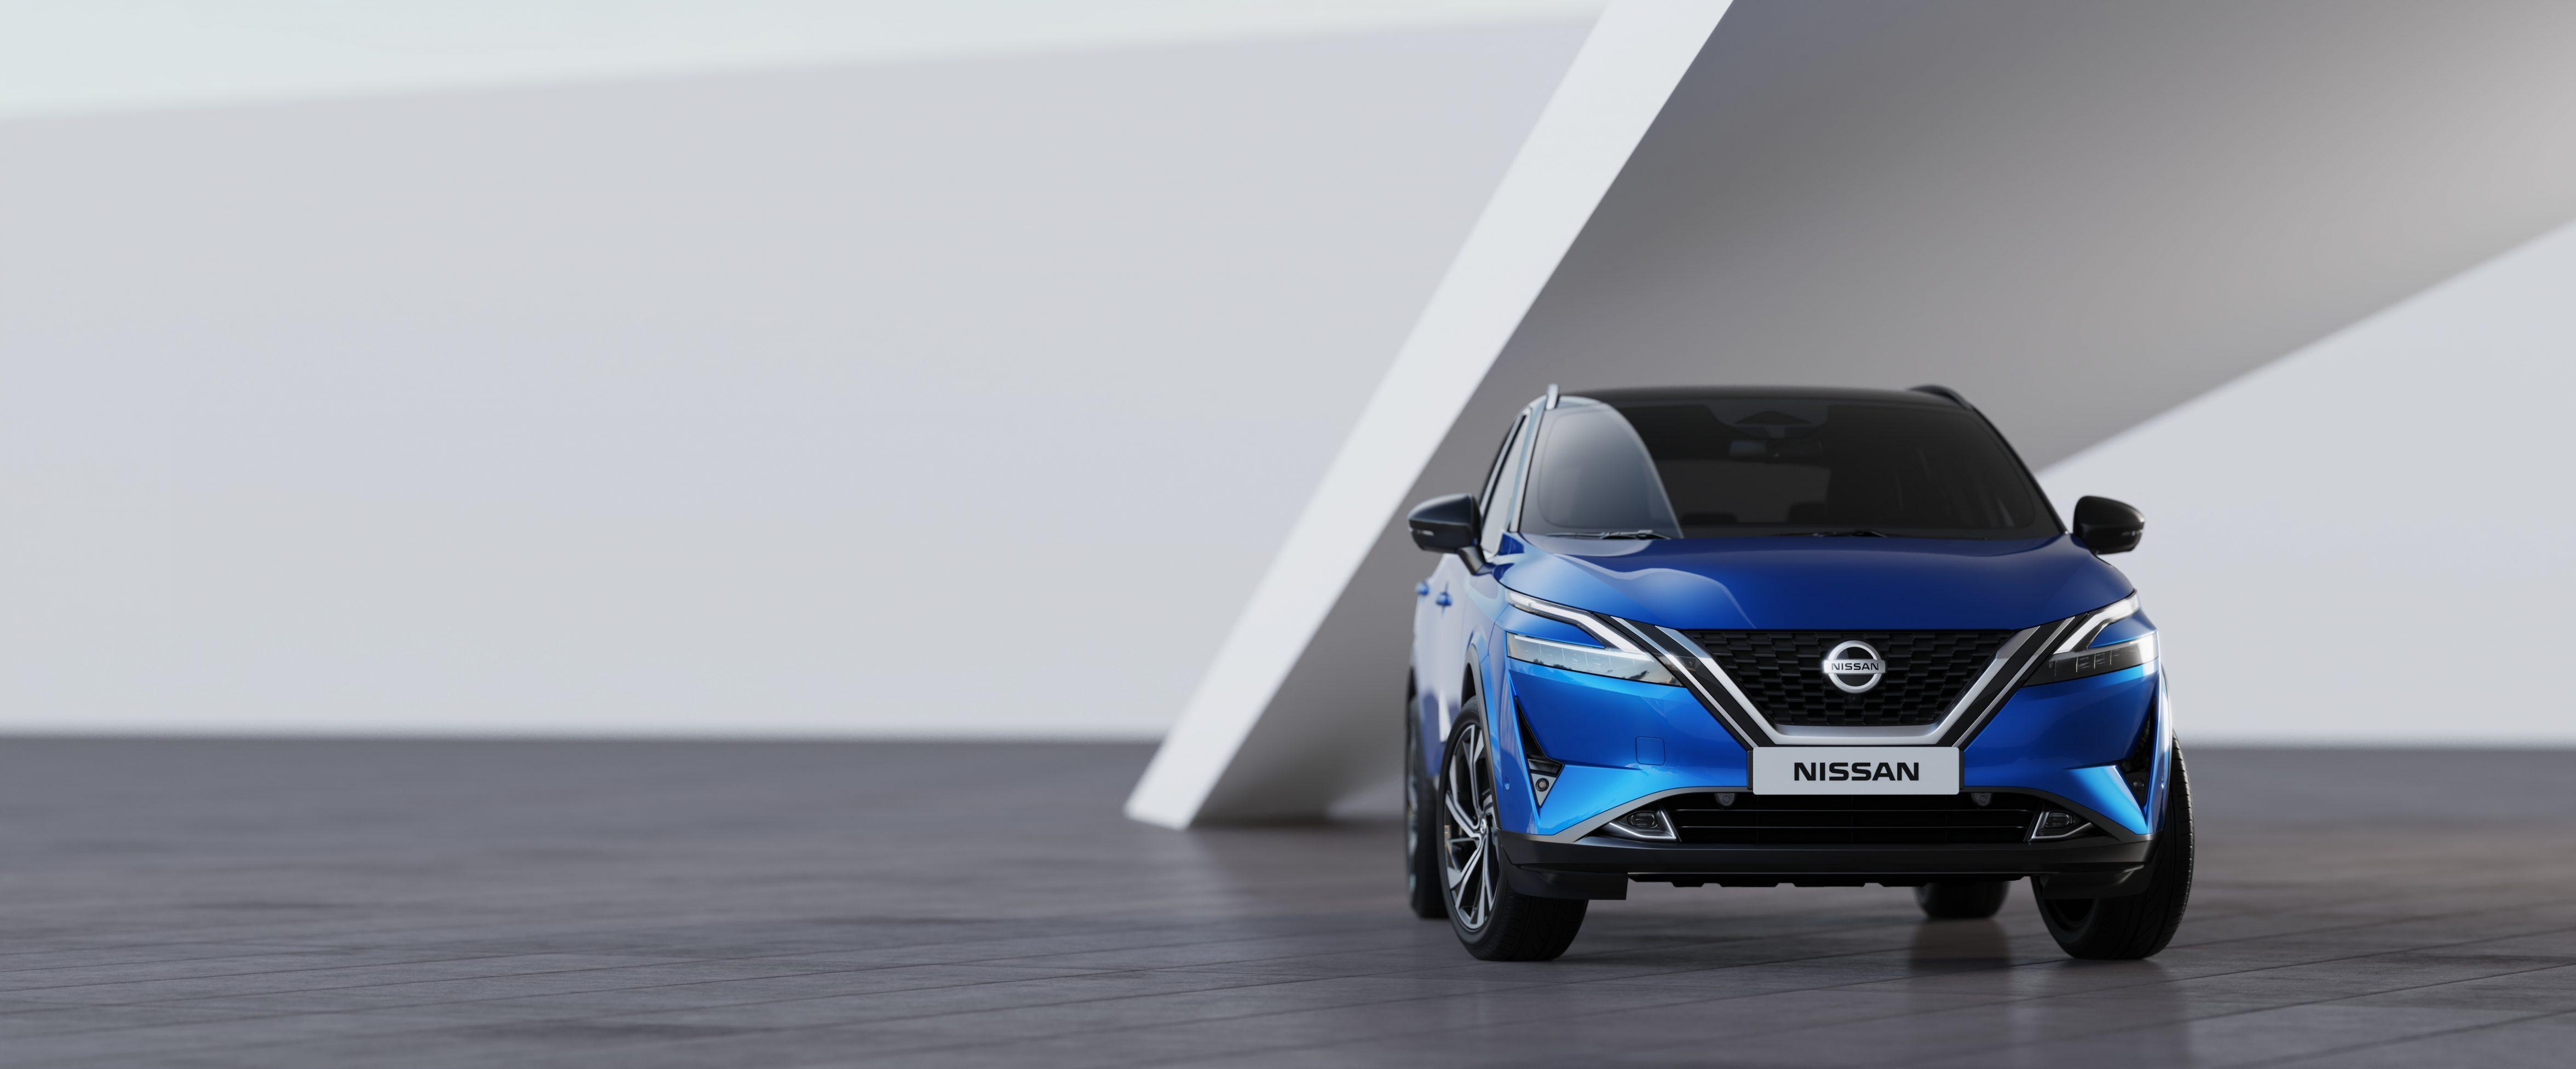 The new Nissan Qashqai has a slick new design that makes the range even sharper.